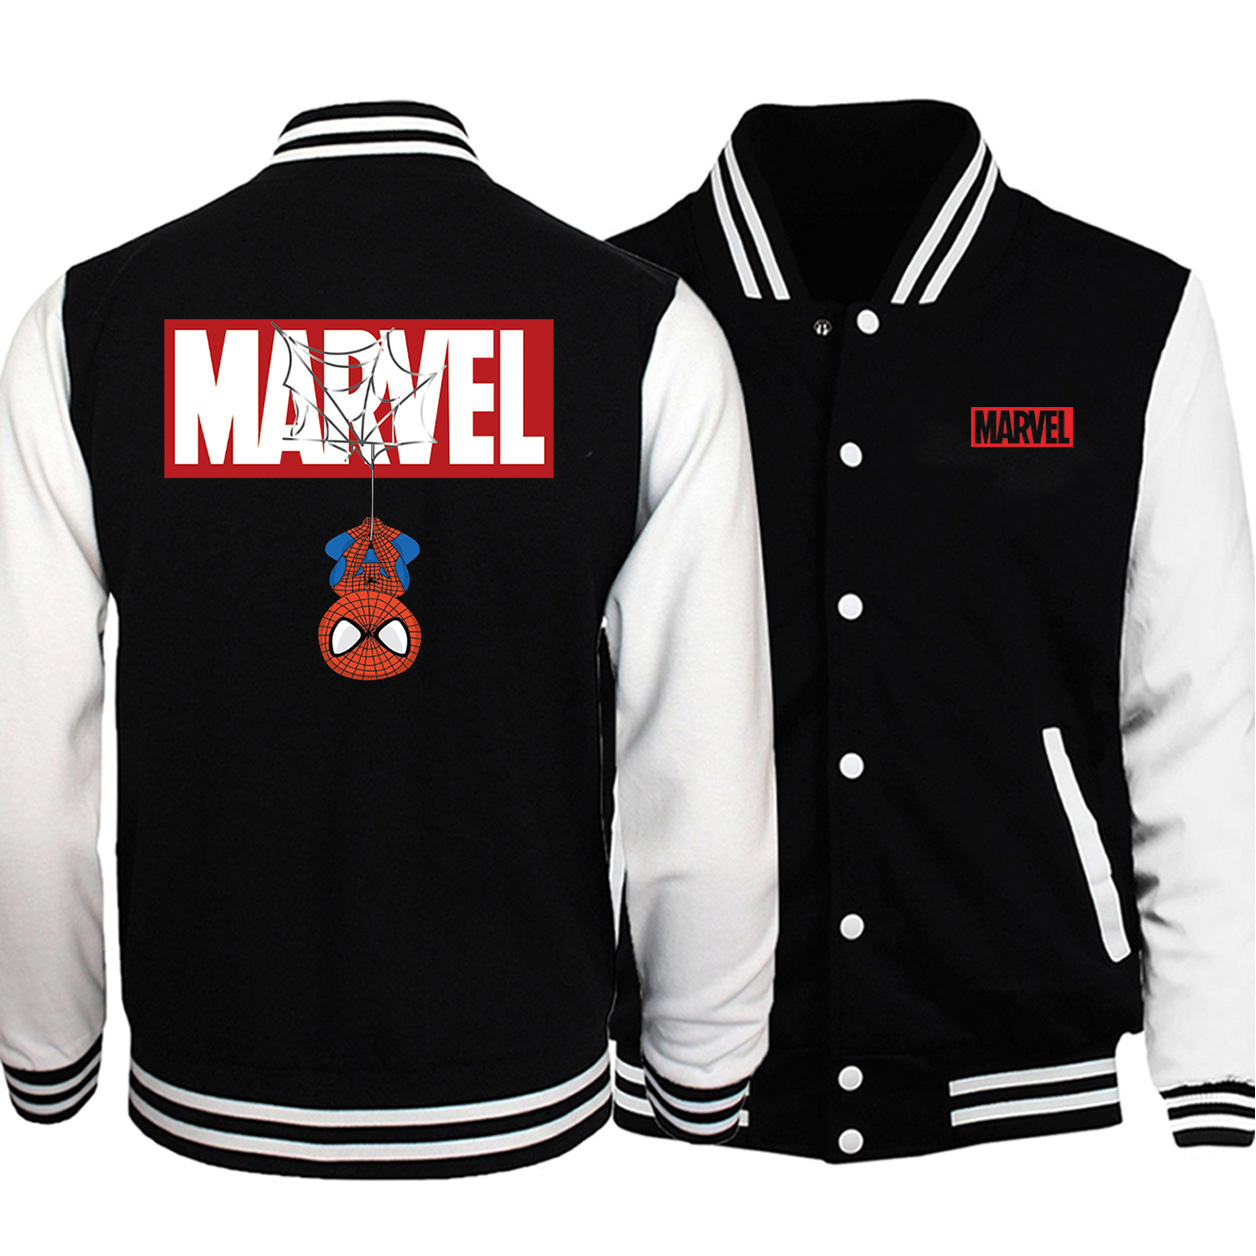 MARVEL Spiderman Print Mens Baseball Jacket 2019 Autumn New Baseball Uniform Men Casual Man Sportswear The Avengers Fashion Coat